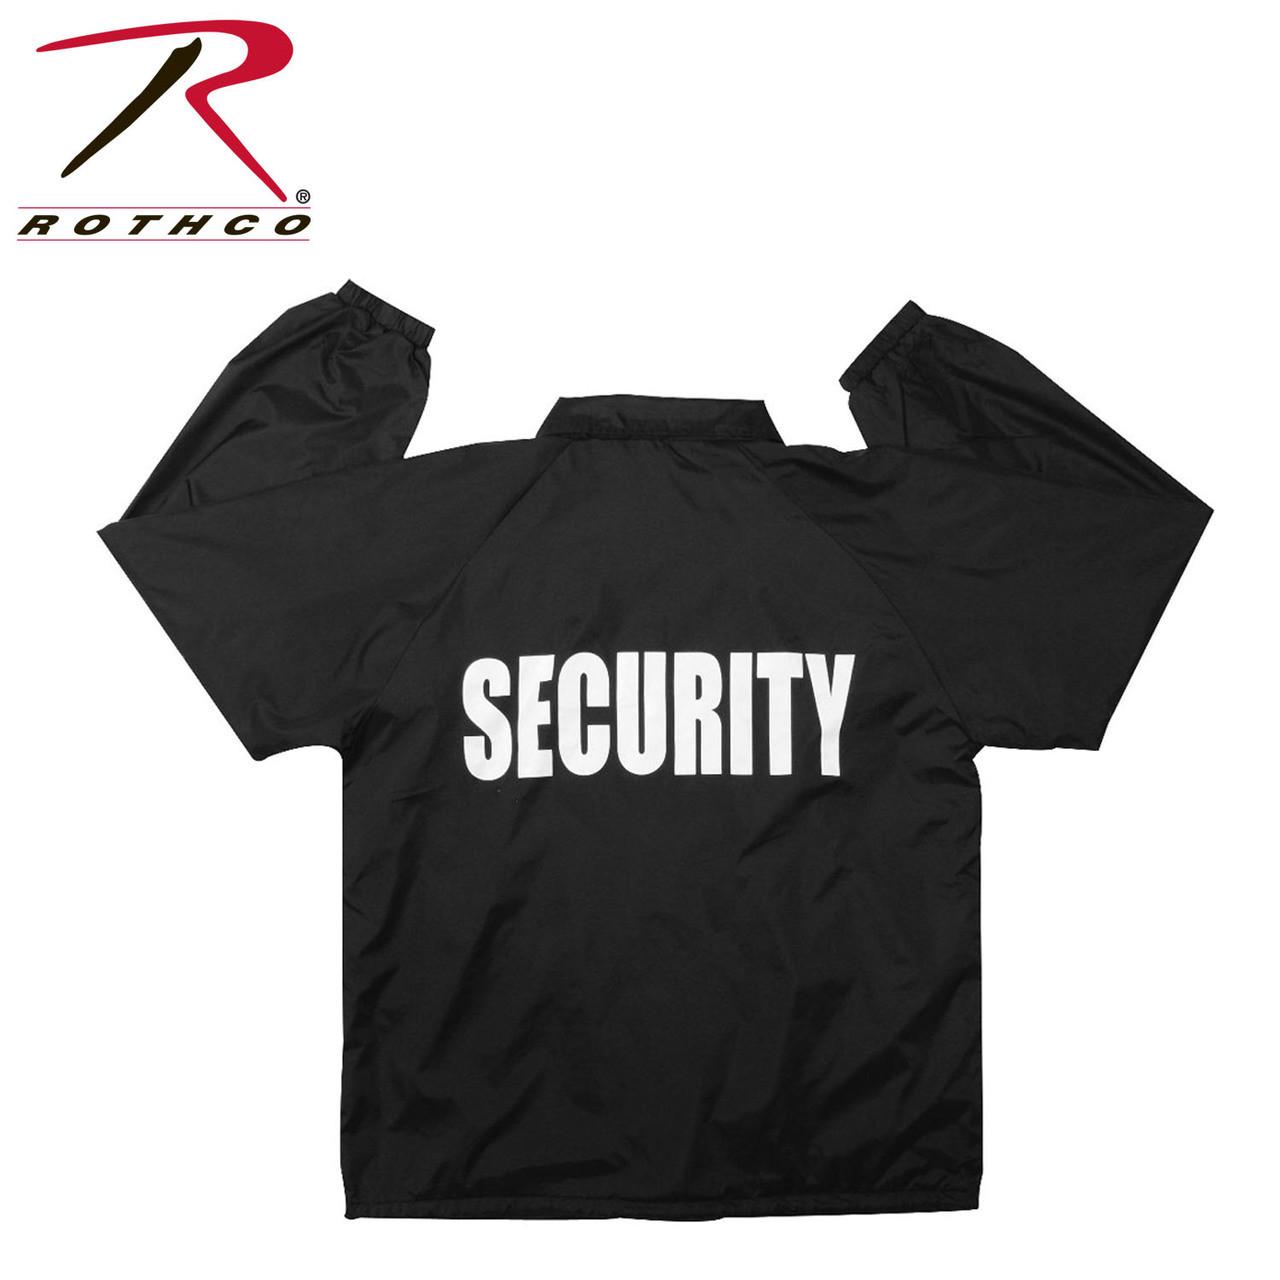 Security Uniform Windbreaker Jacket